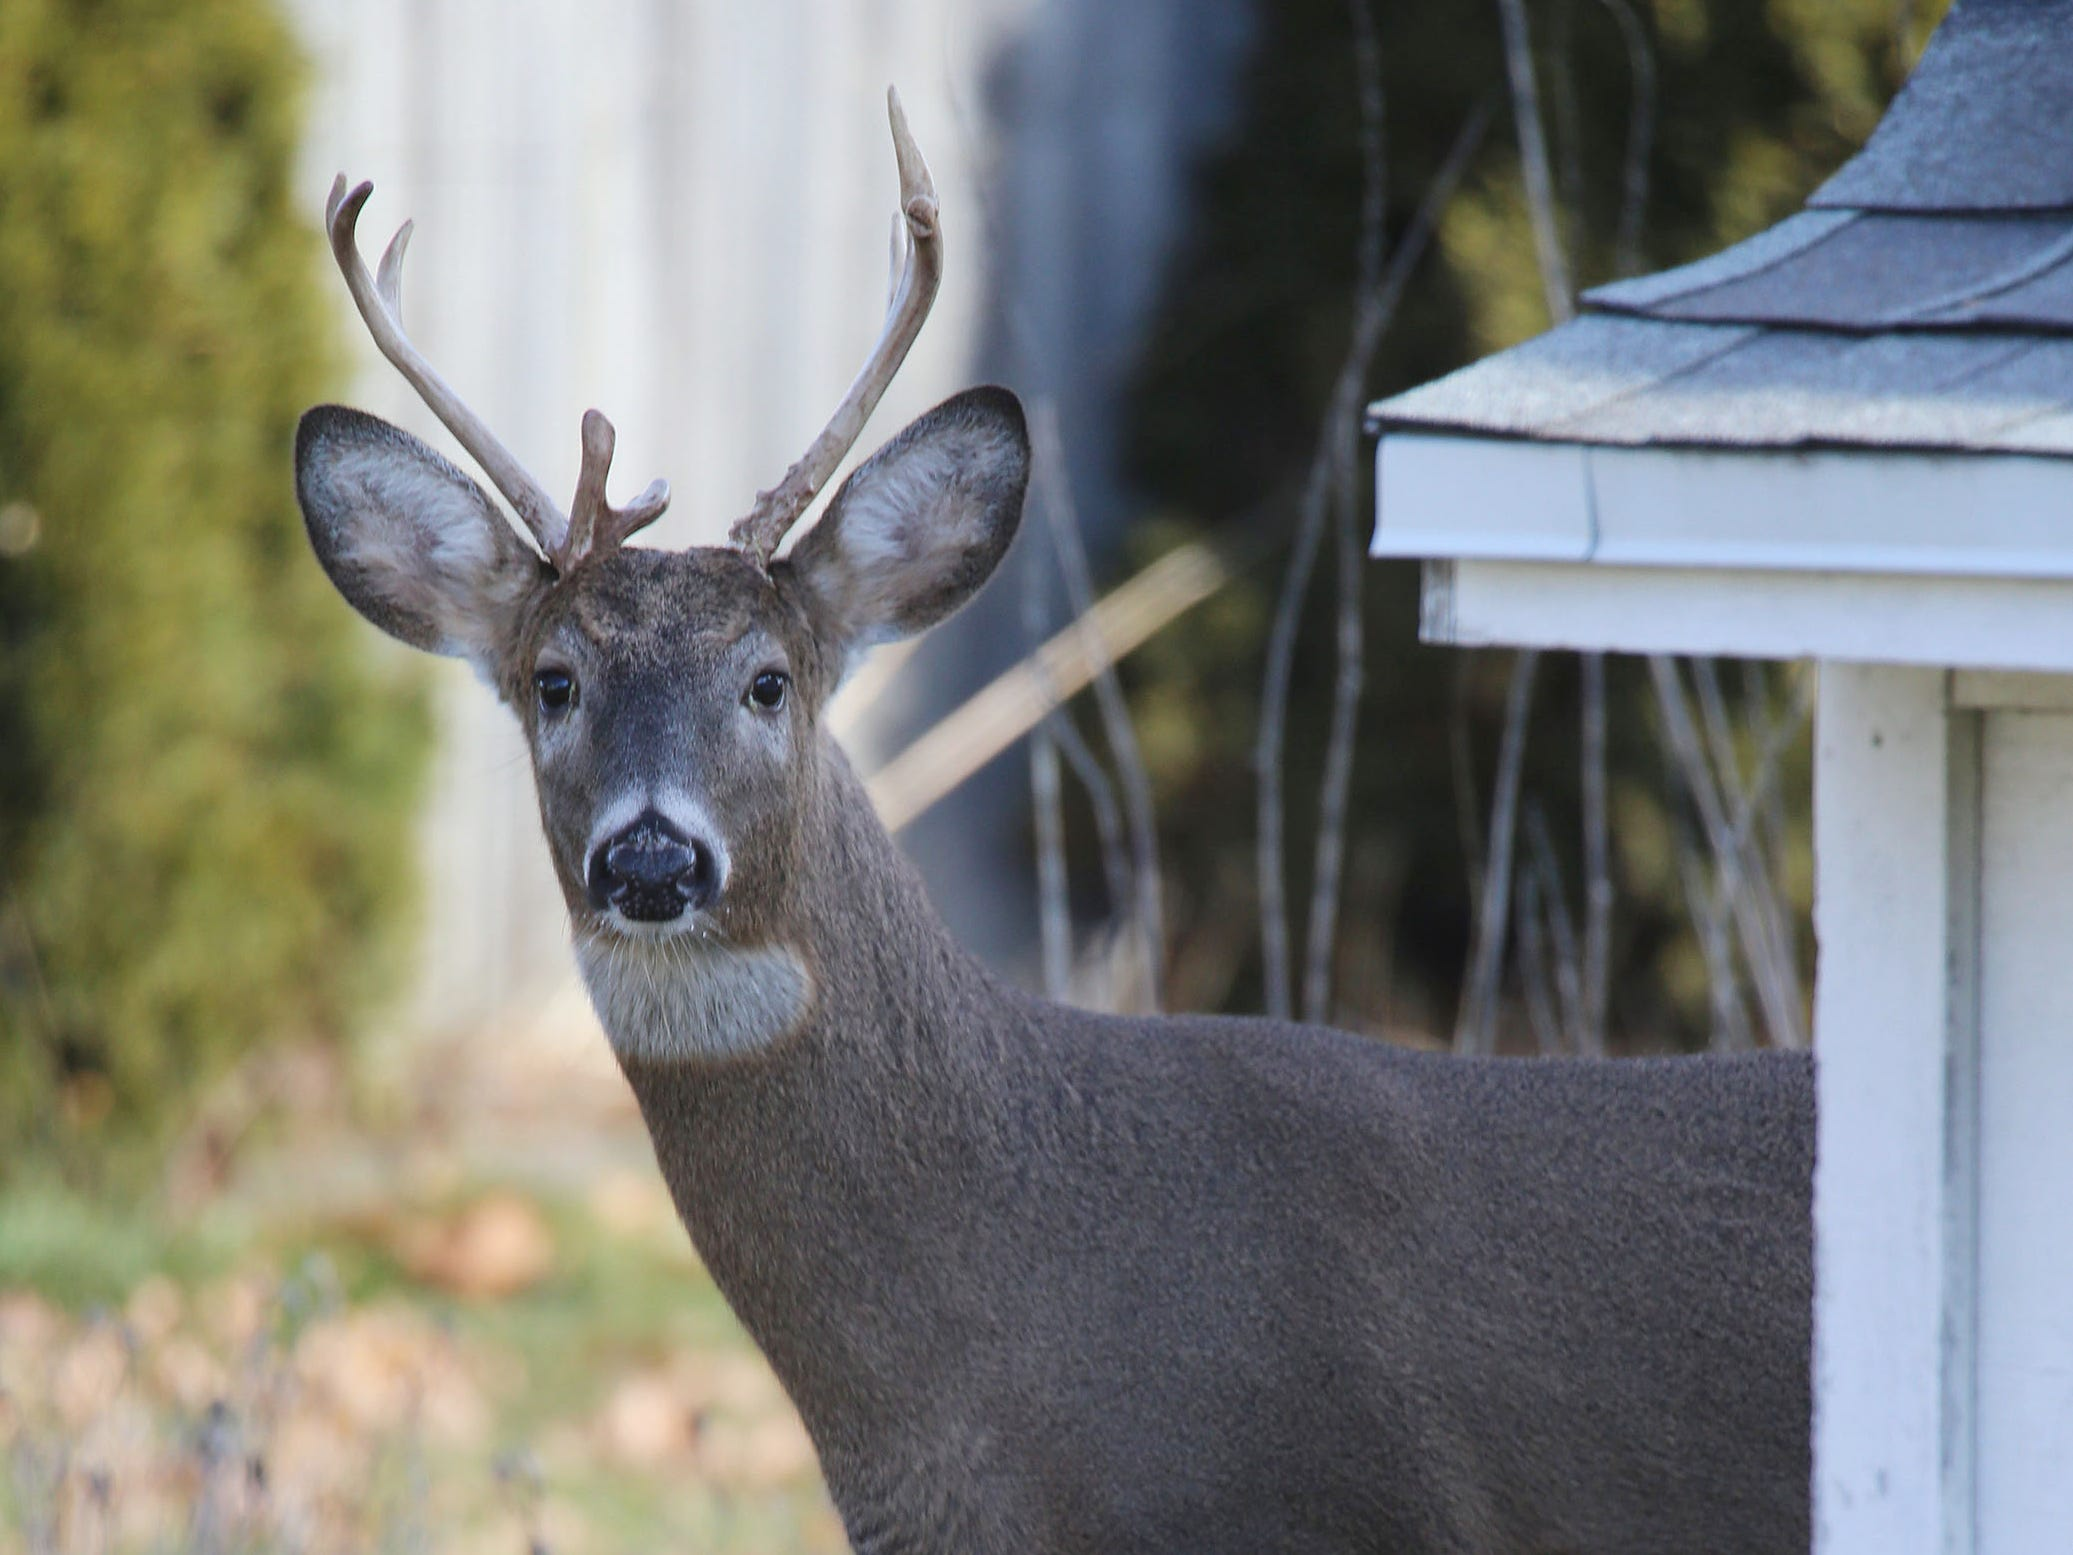 A buck pokes around in a backyard in the 1000 block of North 23rd Street in Sheboygan, Tuesday, November 27, 2018 in Sheboygan, Wis.